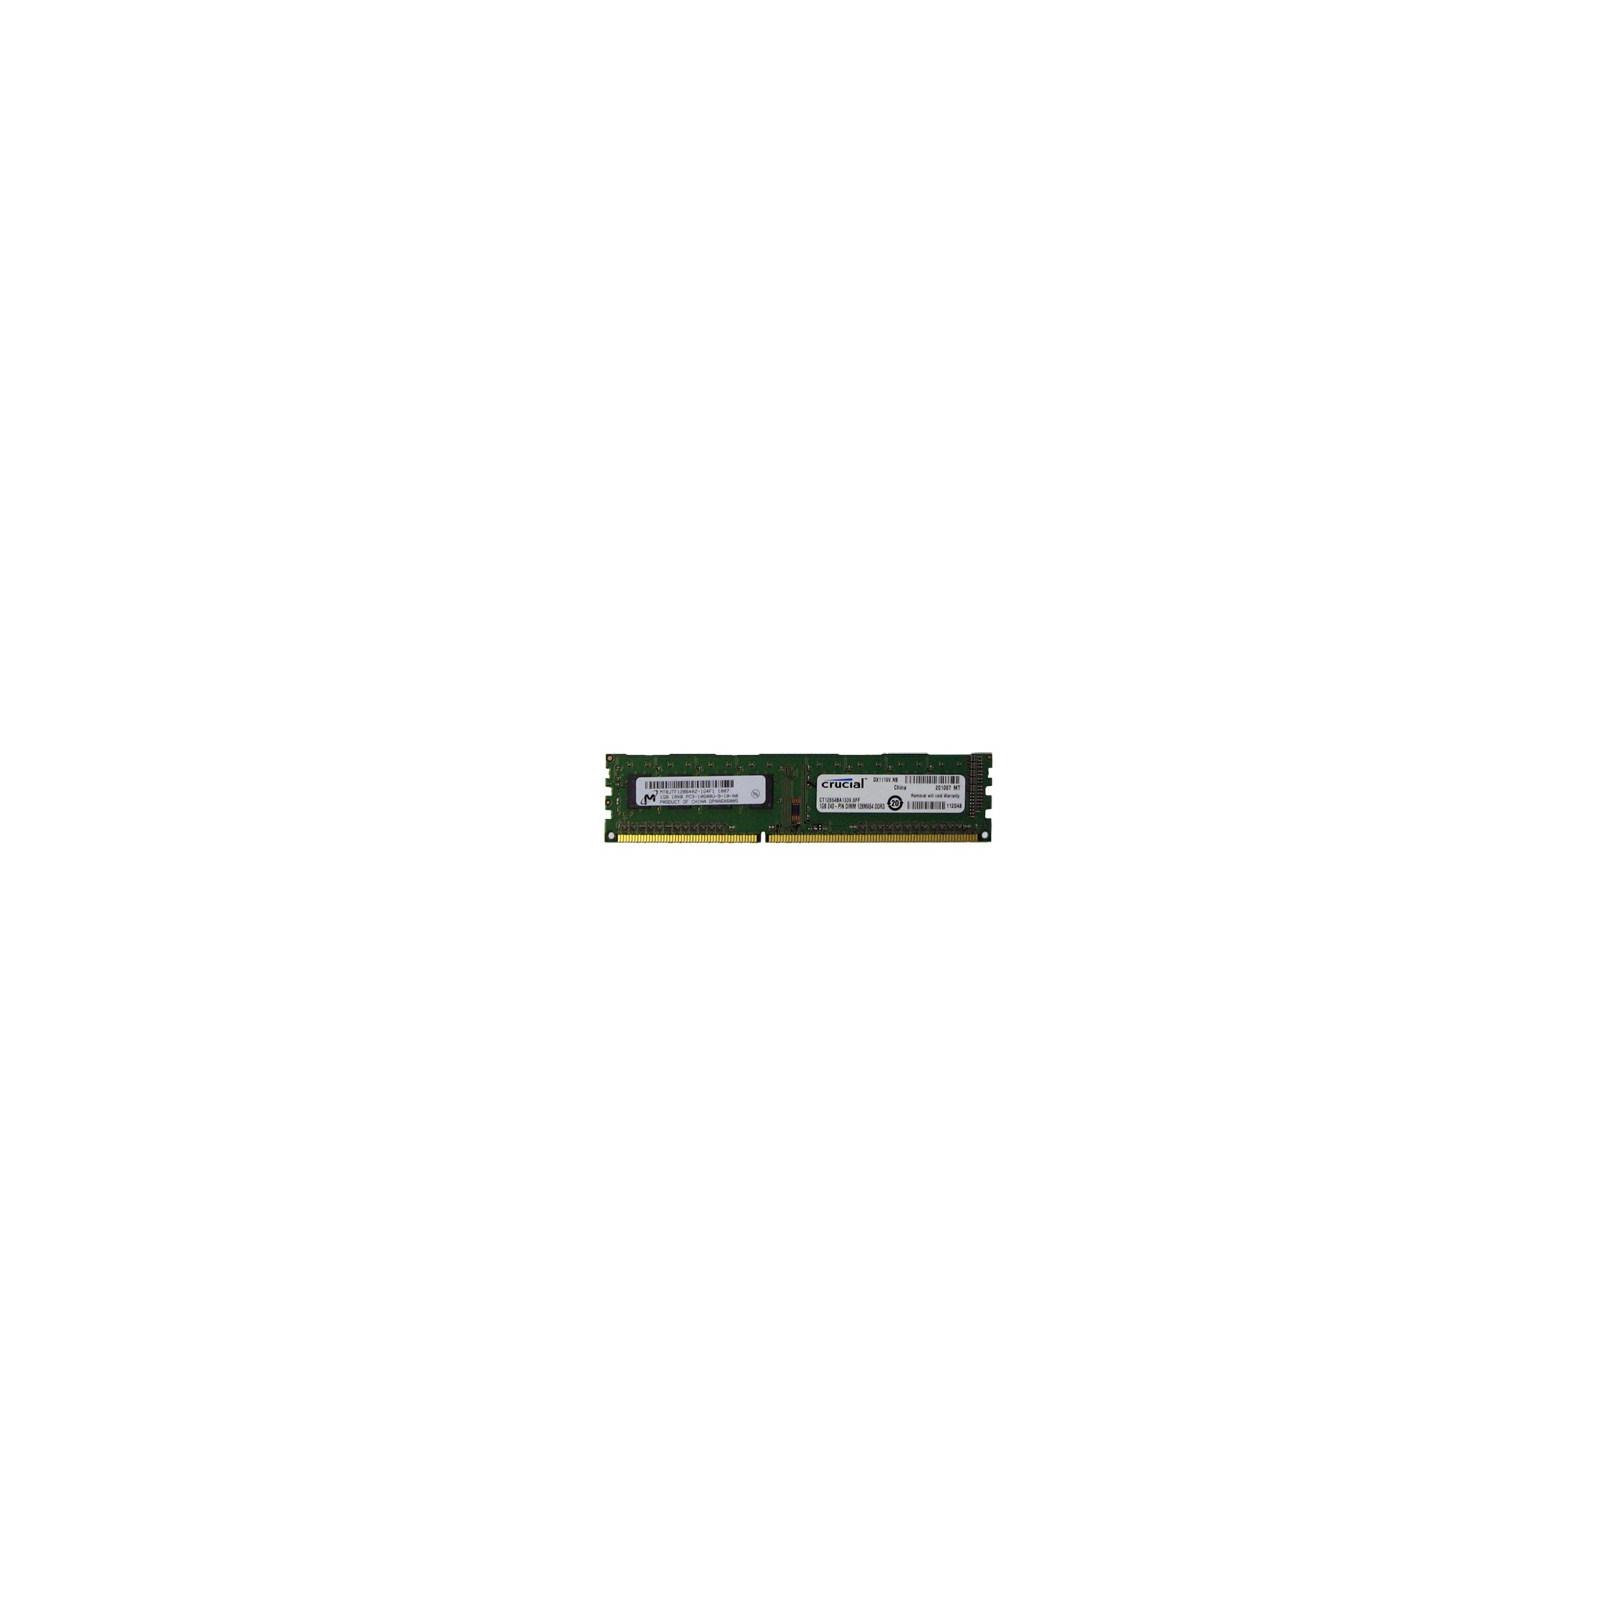 Модуль памяти для компьютера DDR3 1GB 1333 MHz MICRON (CT12864BA1339)